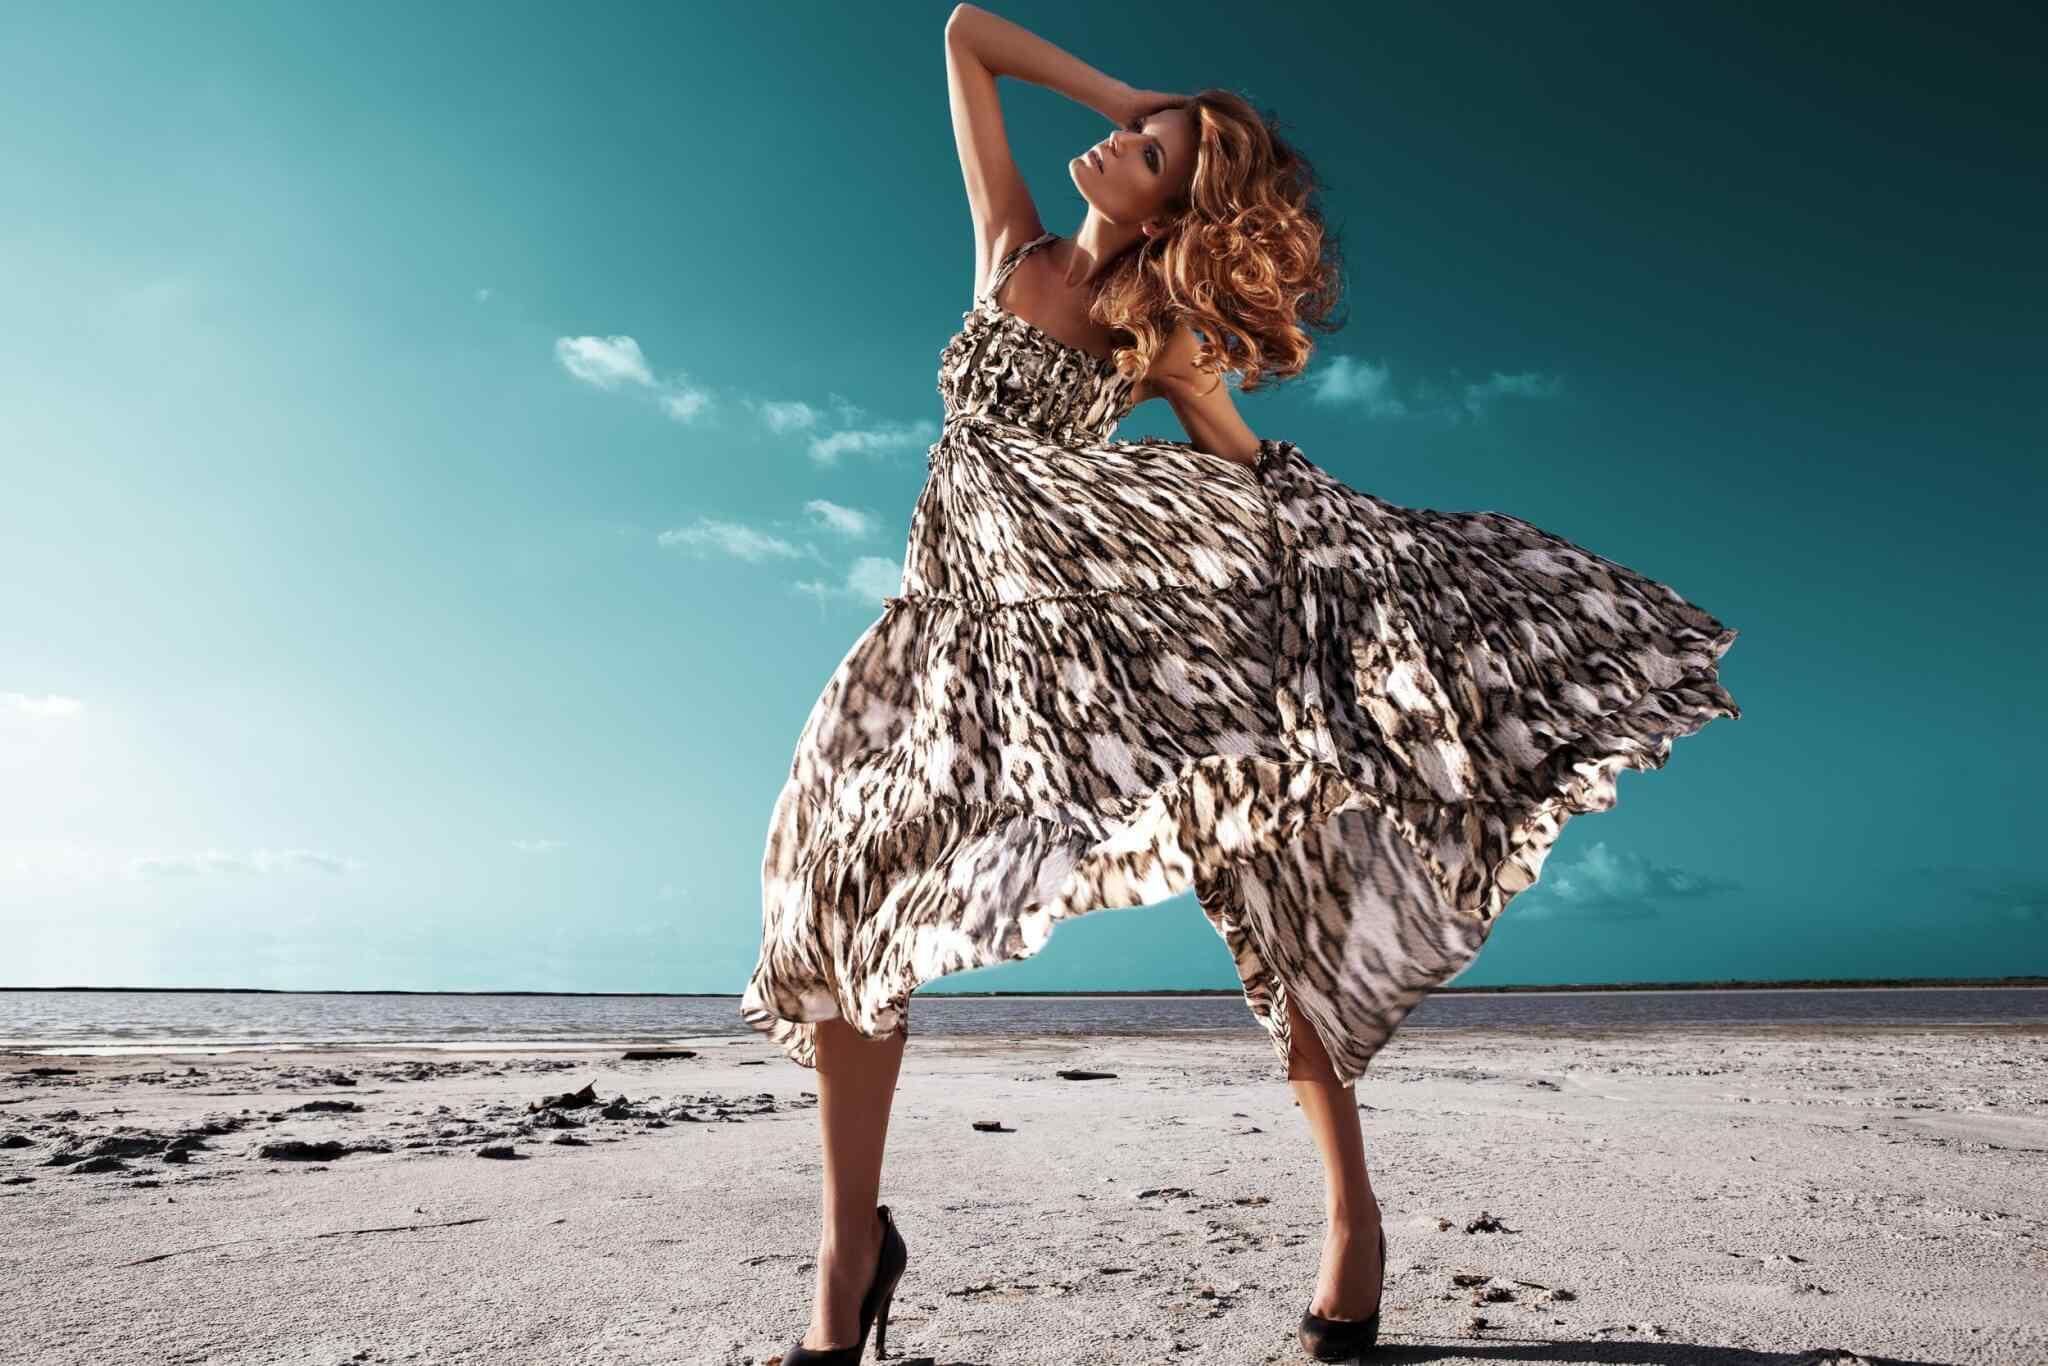 https://mediterranean.observer/wp-content/uploads/2017/03/fashion_3.jpg